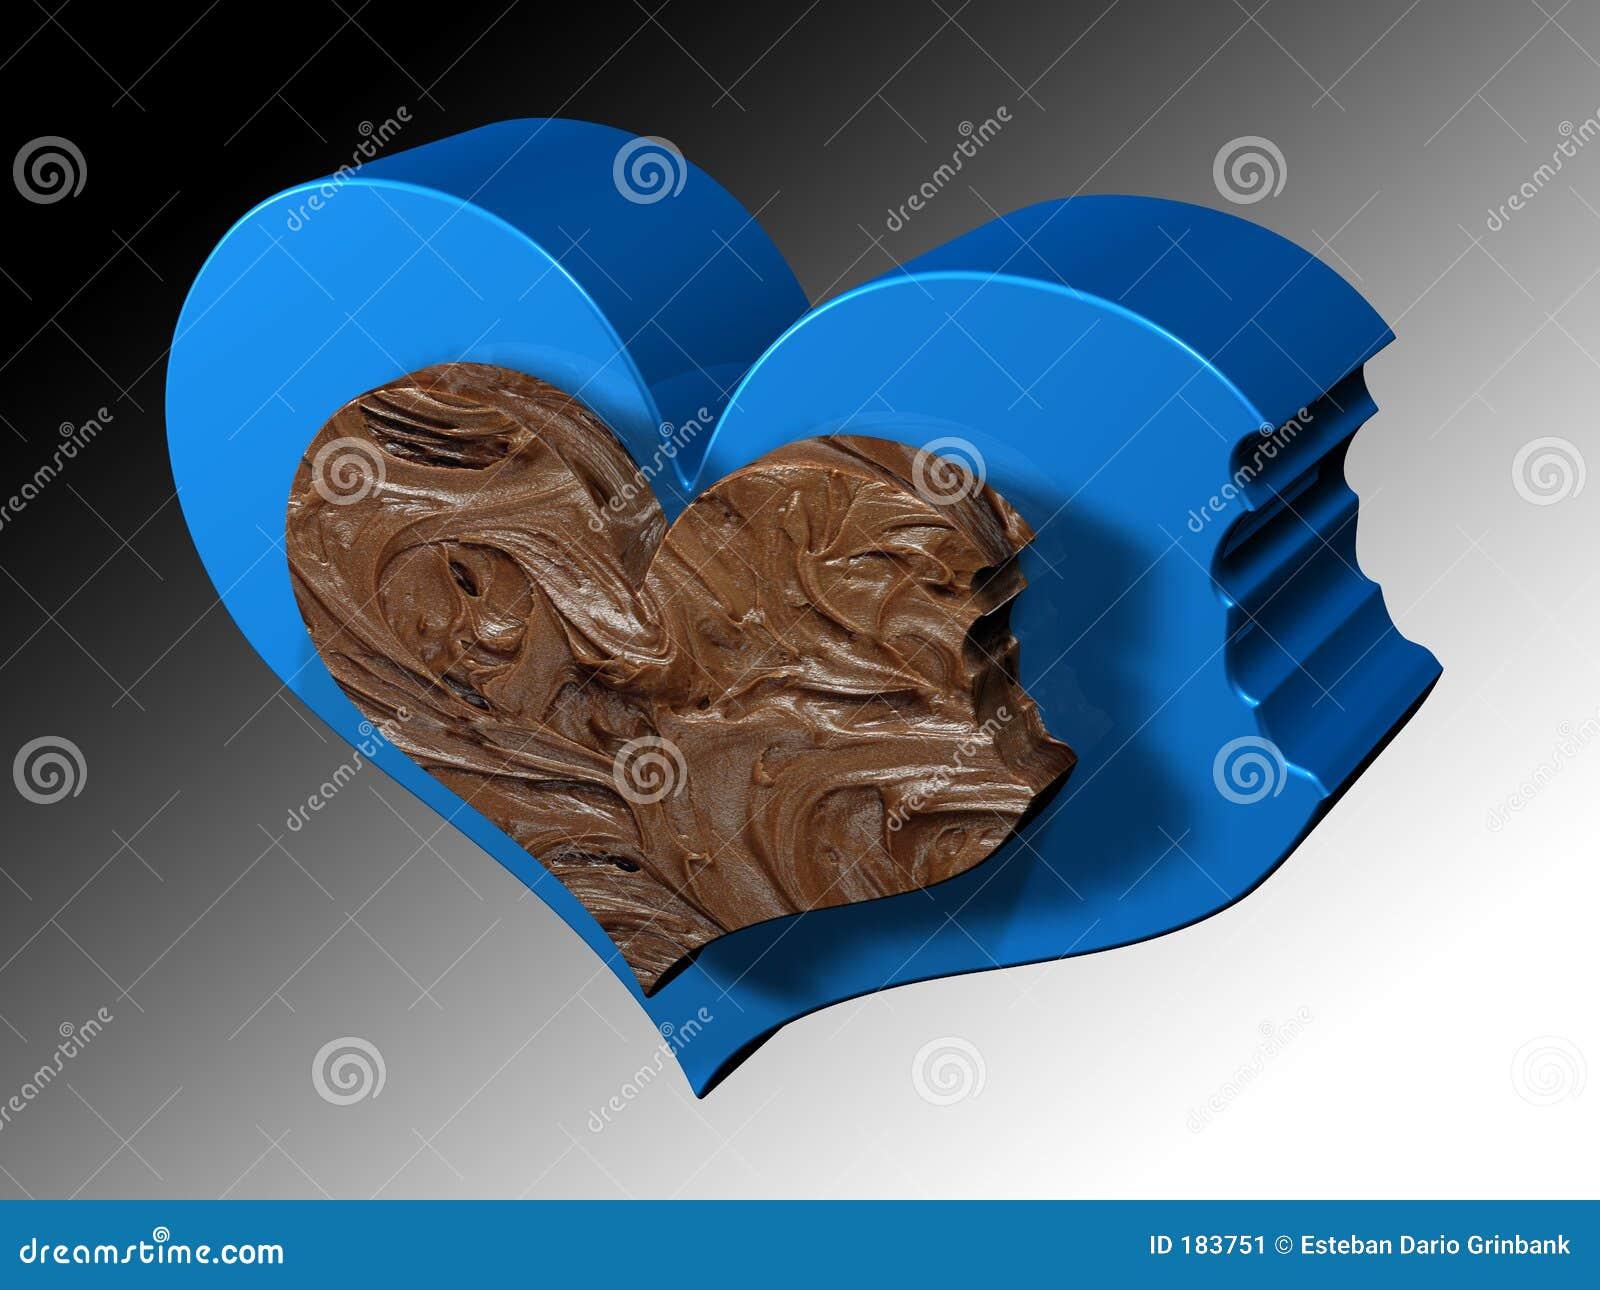 HEART.jpg PUNGENTE BLU